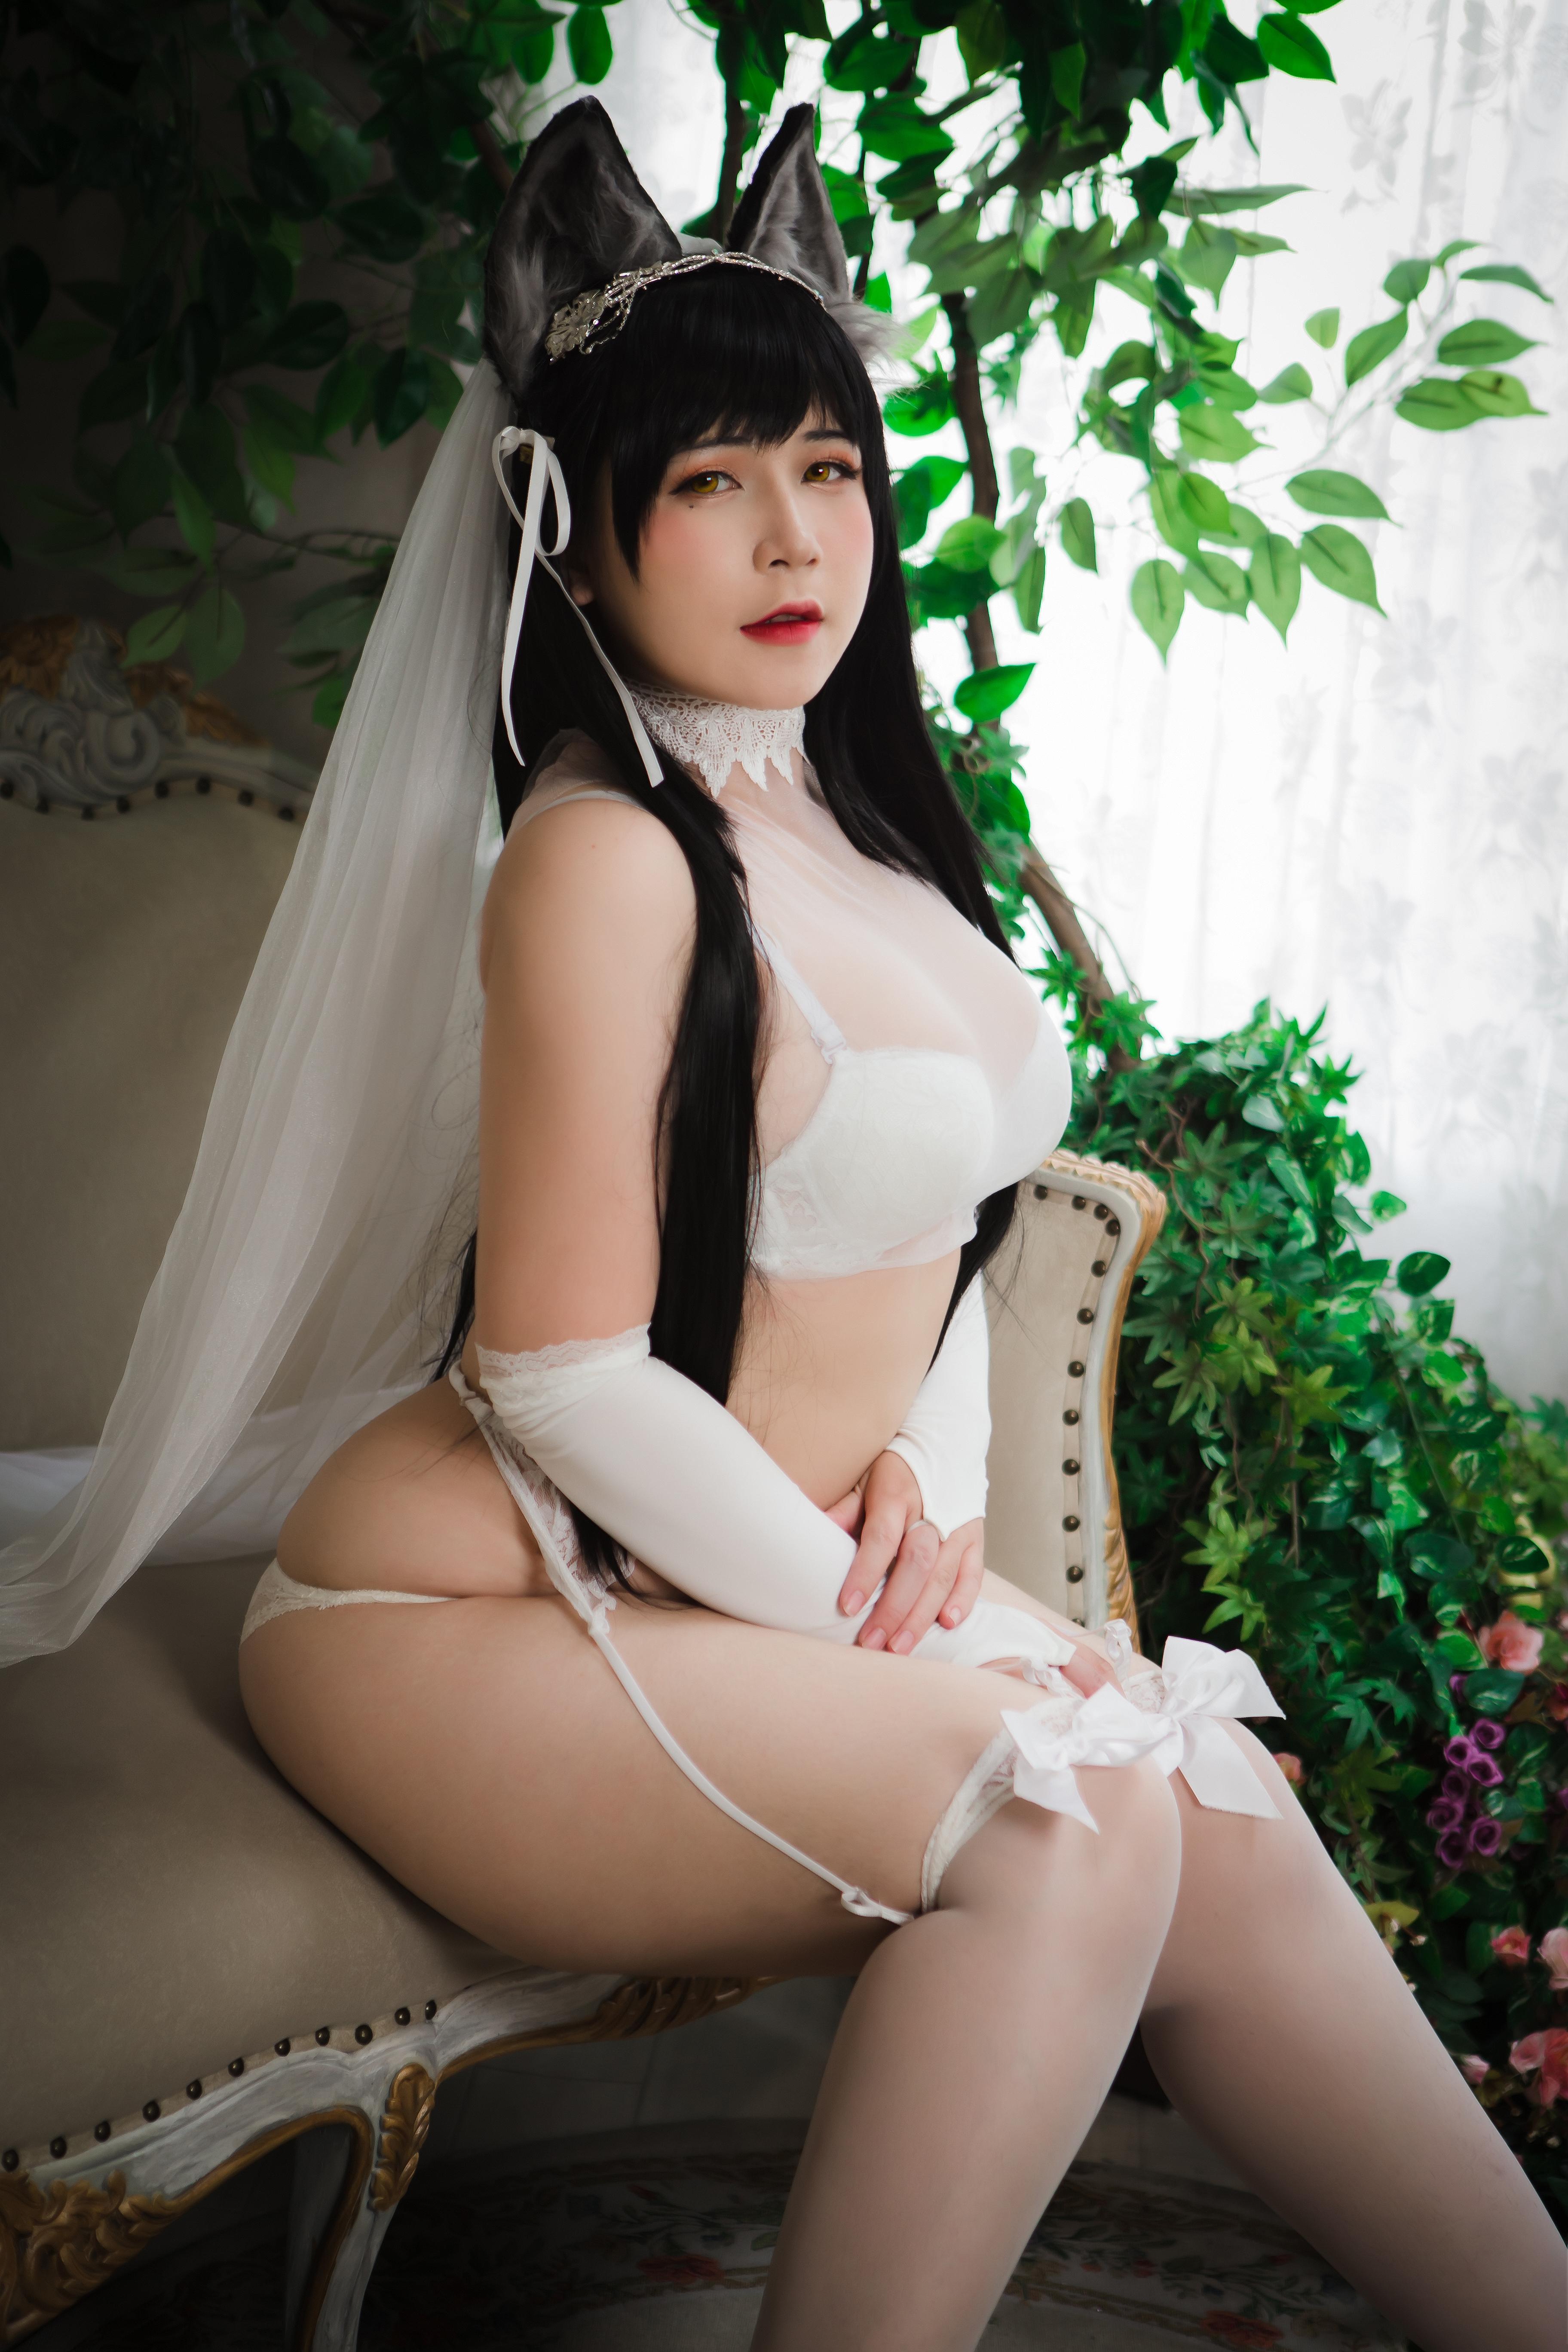 Uy UyAtago Wedding (阿塔戈婚礼)COS作品鉴赏-觅爱图